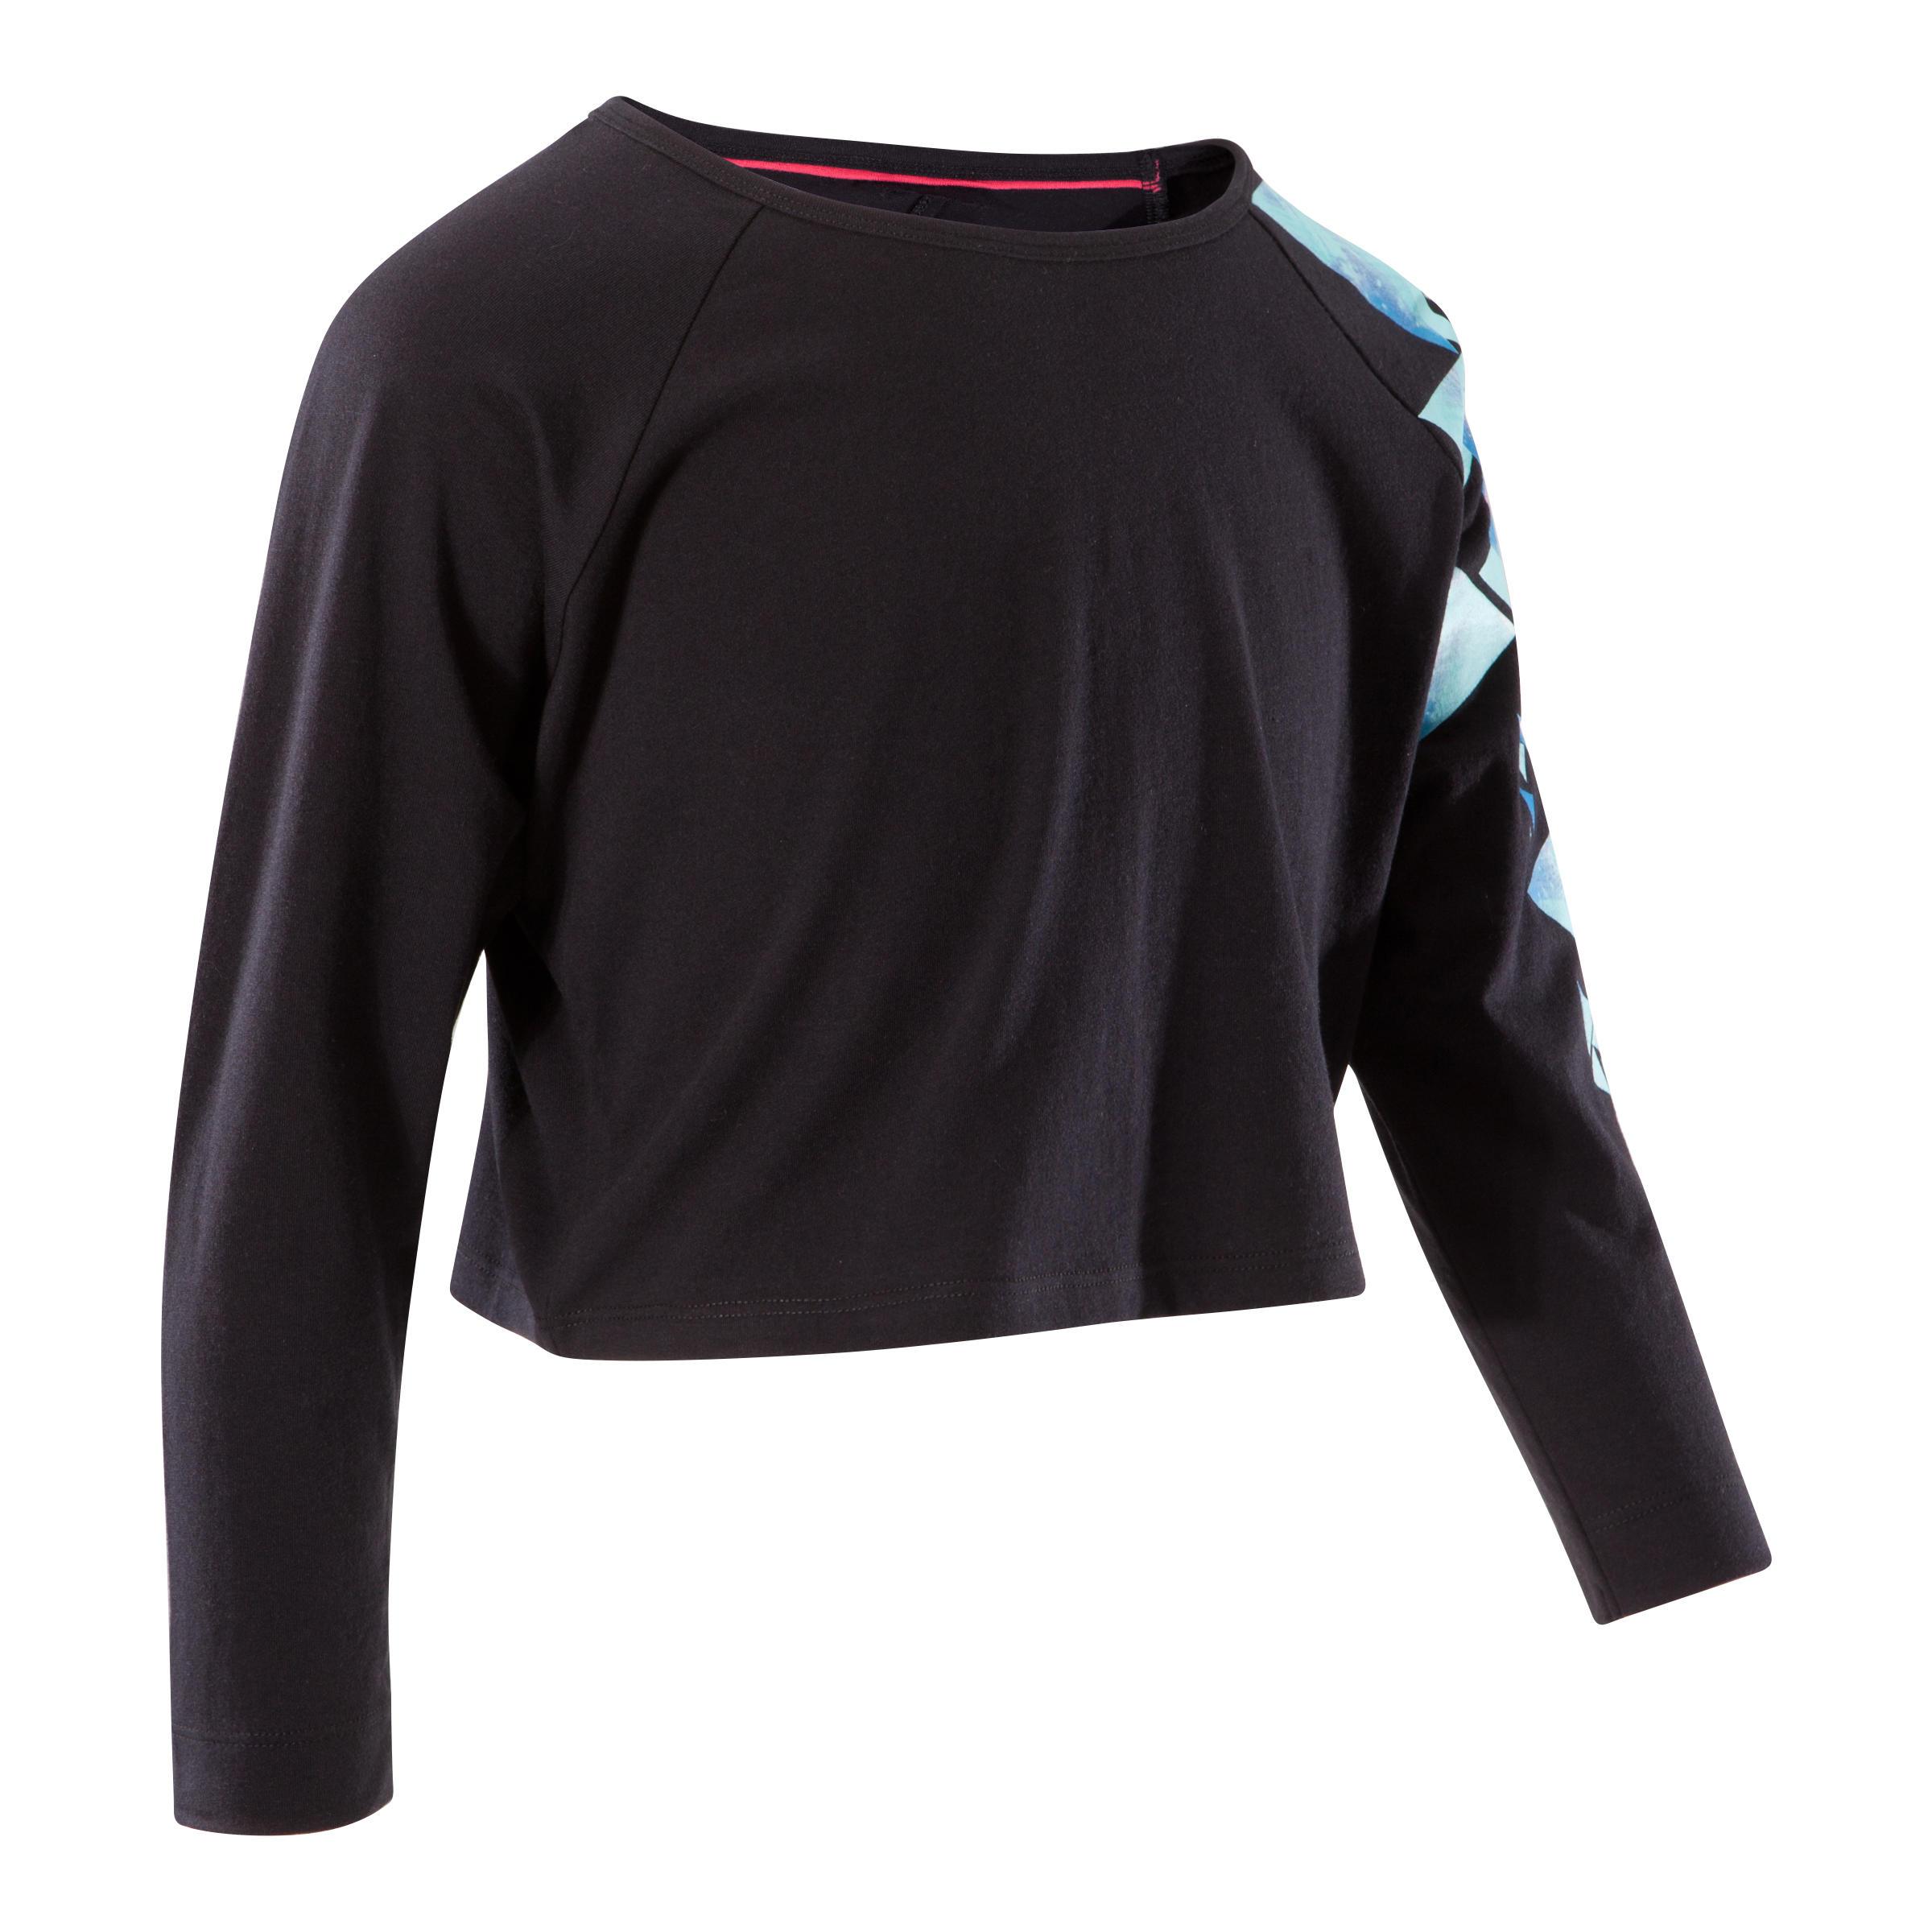 Girls' Loose Short Long-Sleeved Dance T-Shirt - Black